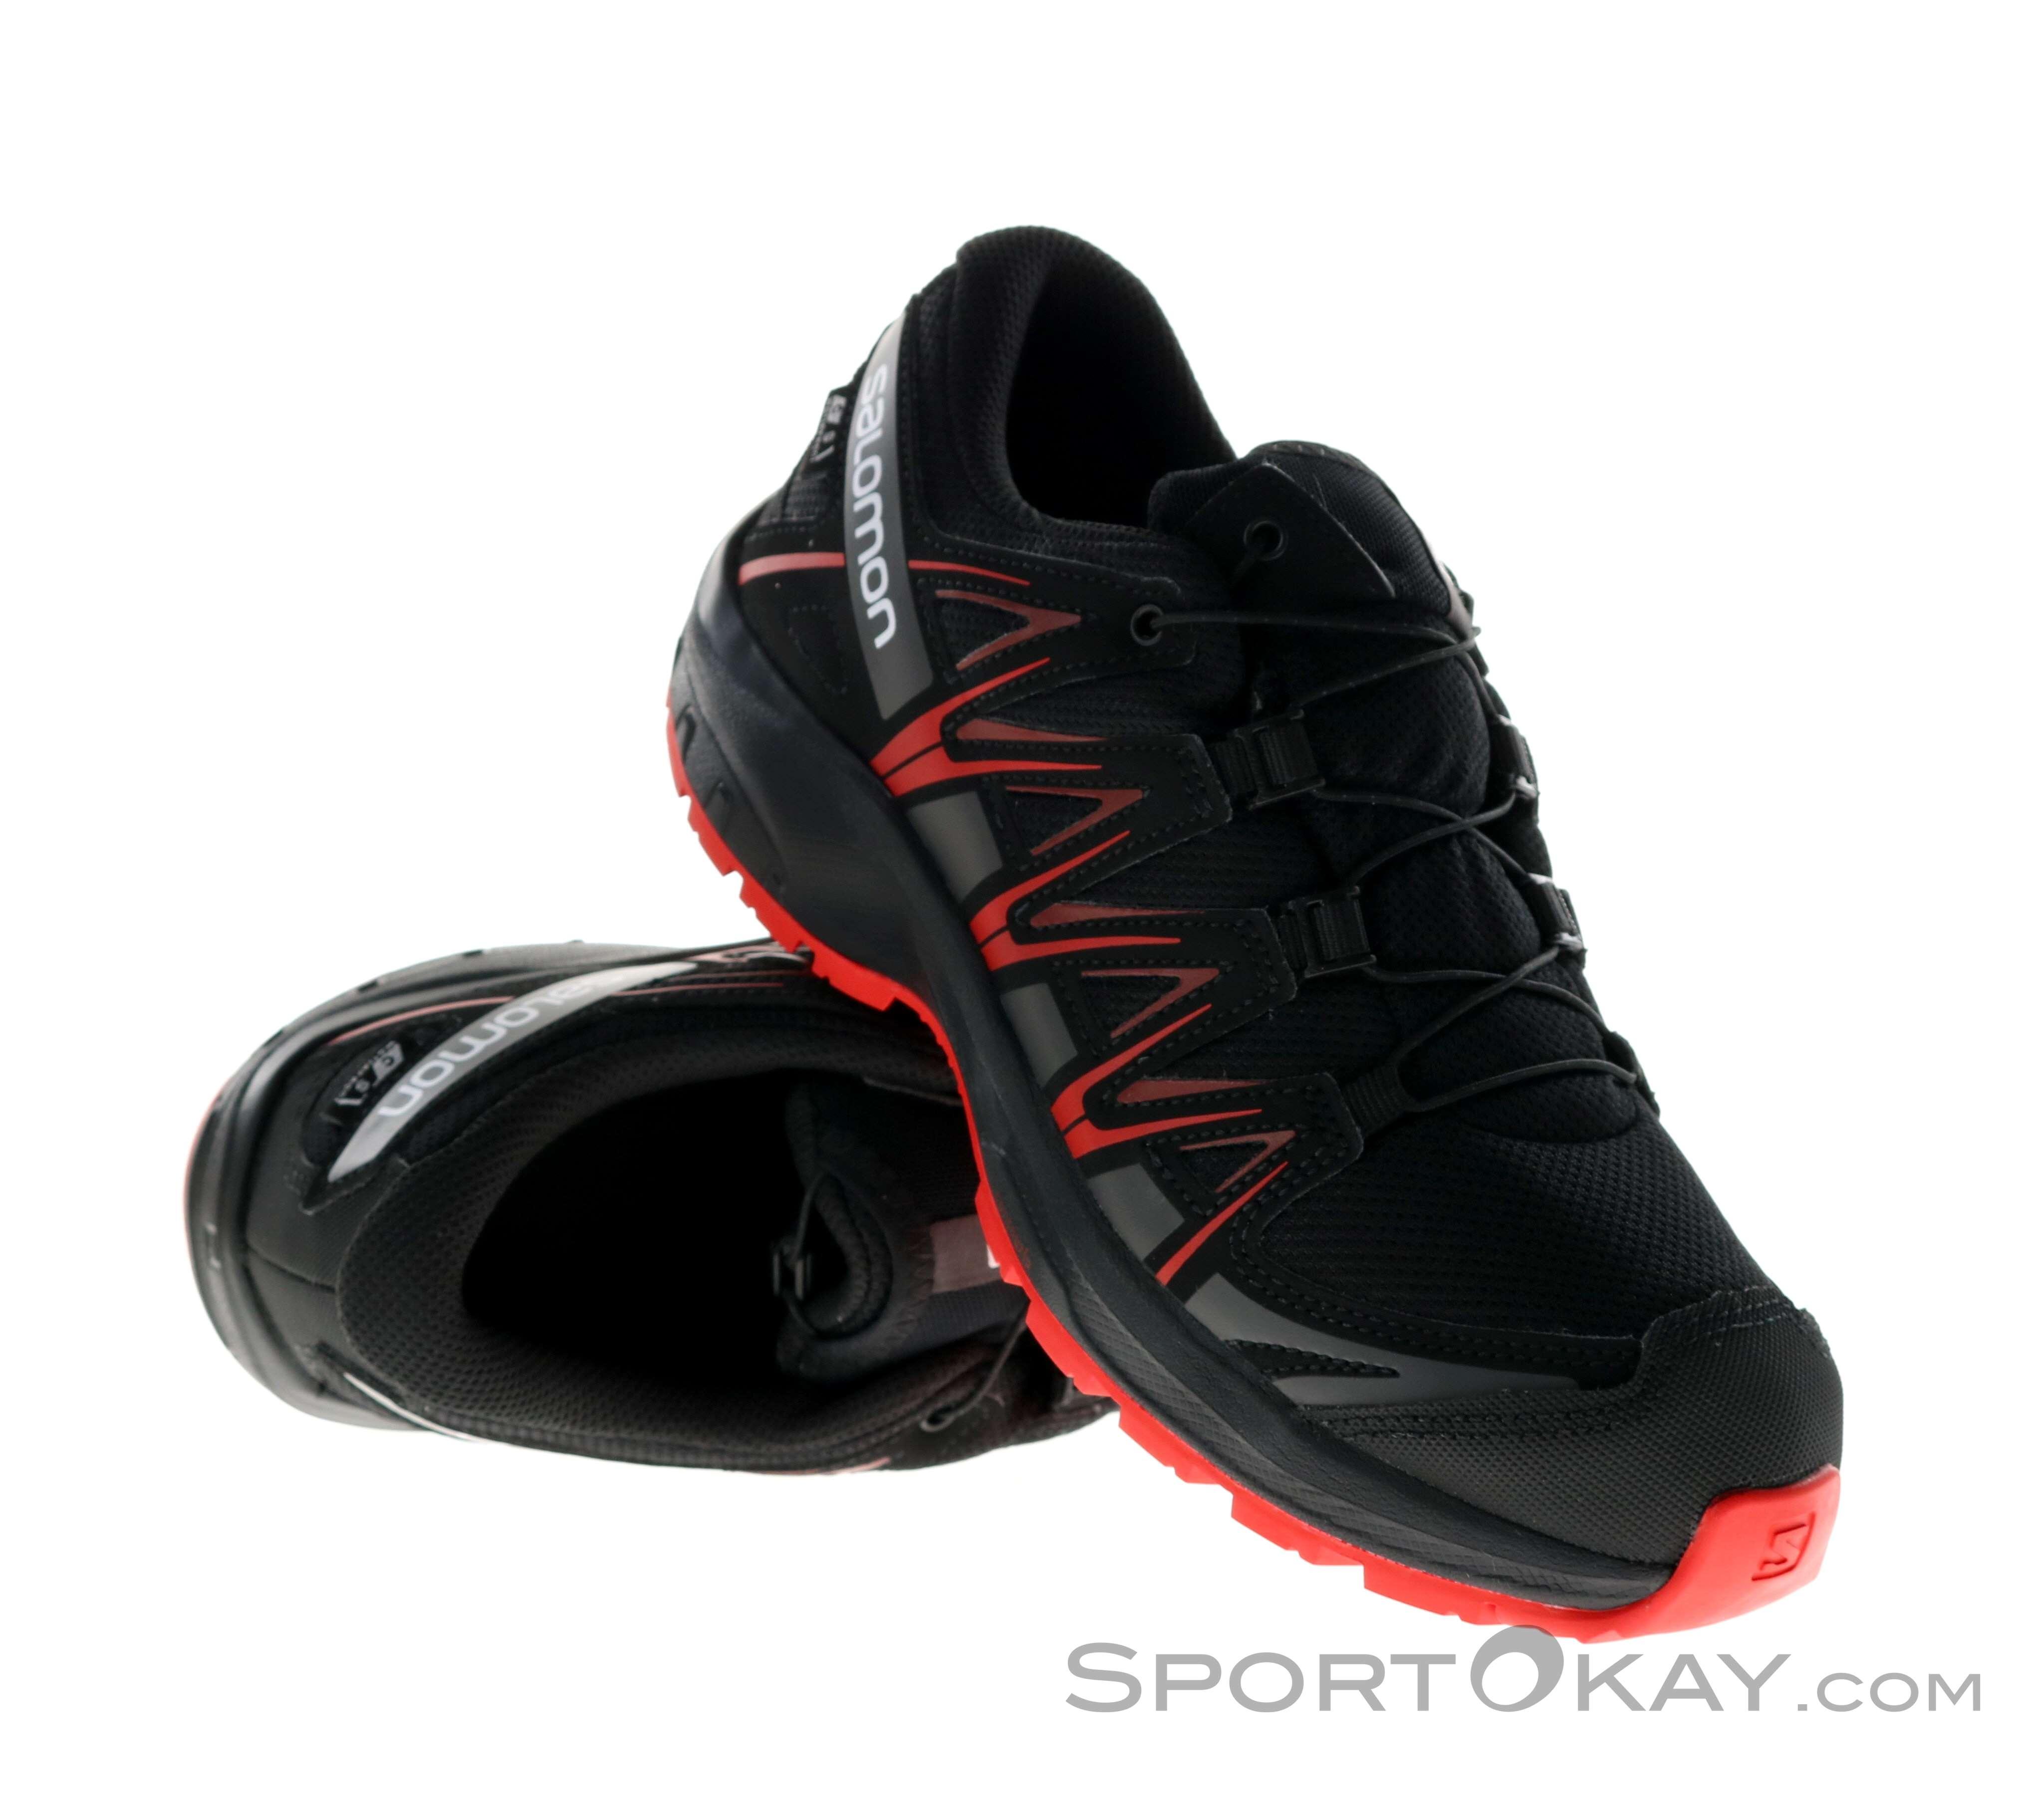 Salomon Xa Pro 3D J Trail Running Shoe